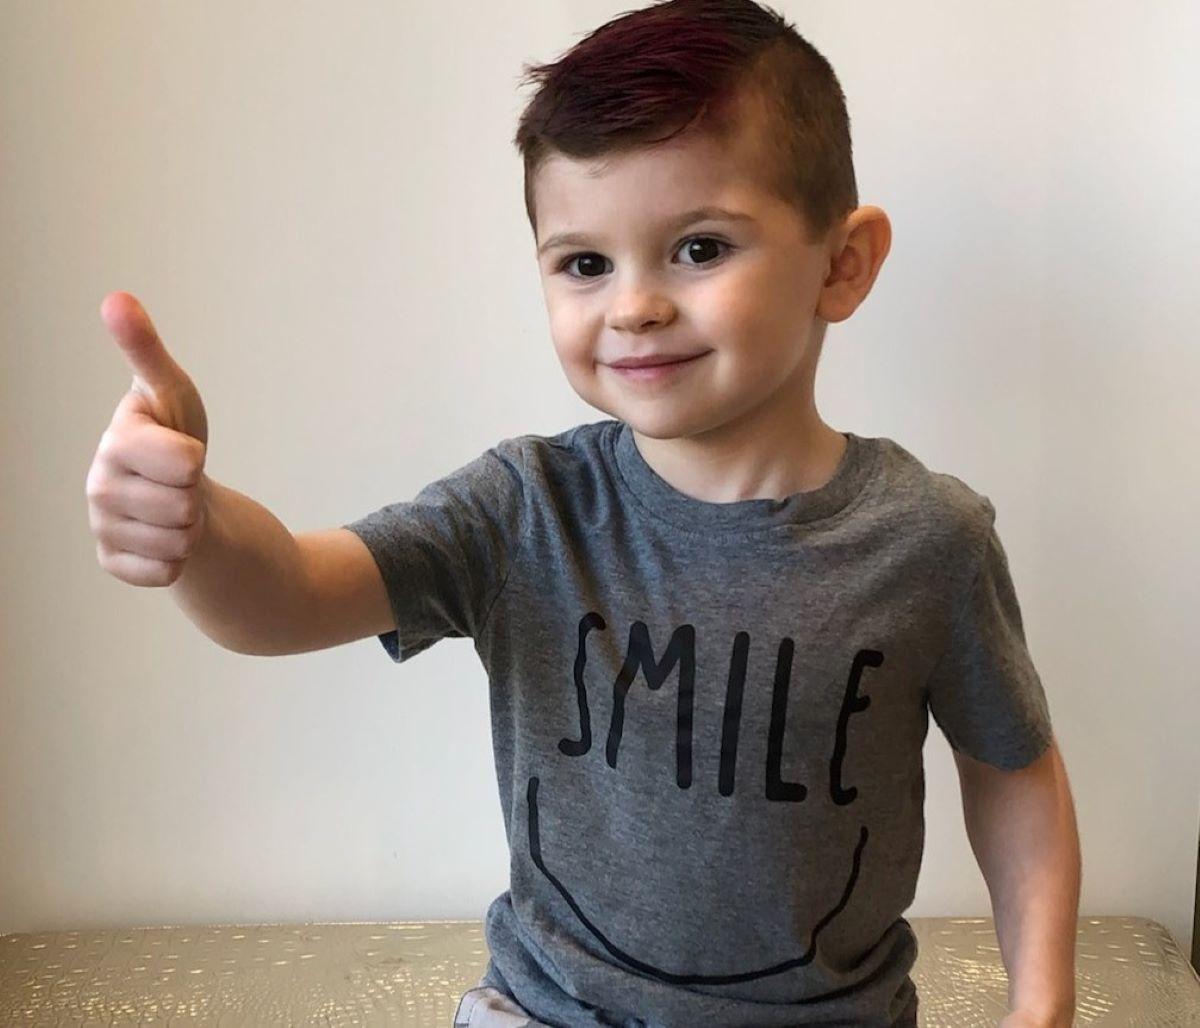 Kache Wallis Morto 4  anni Scatola Giocattoli Utah